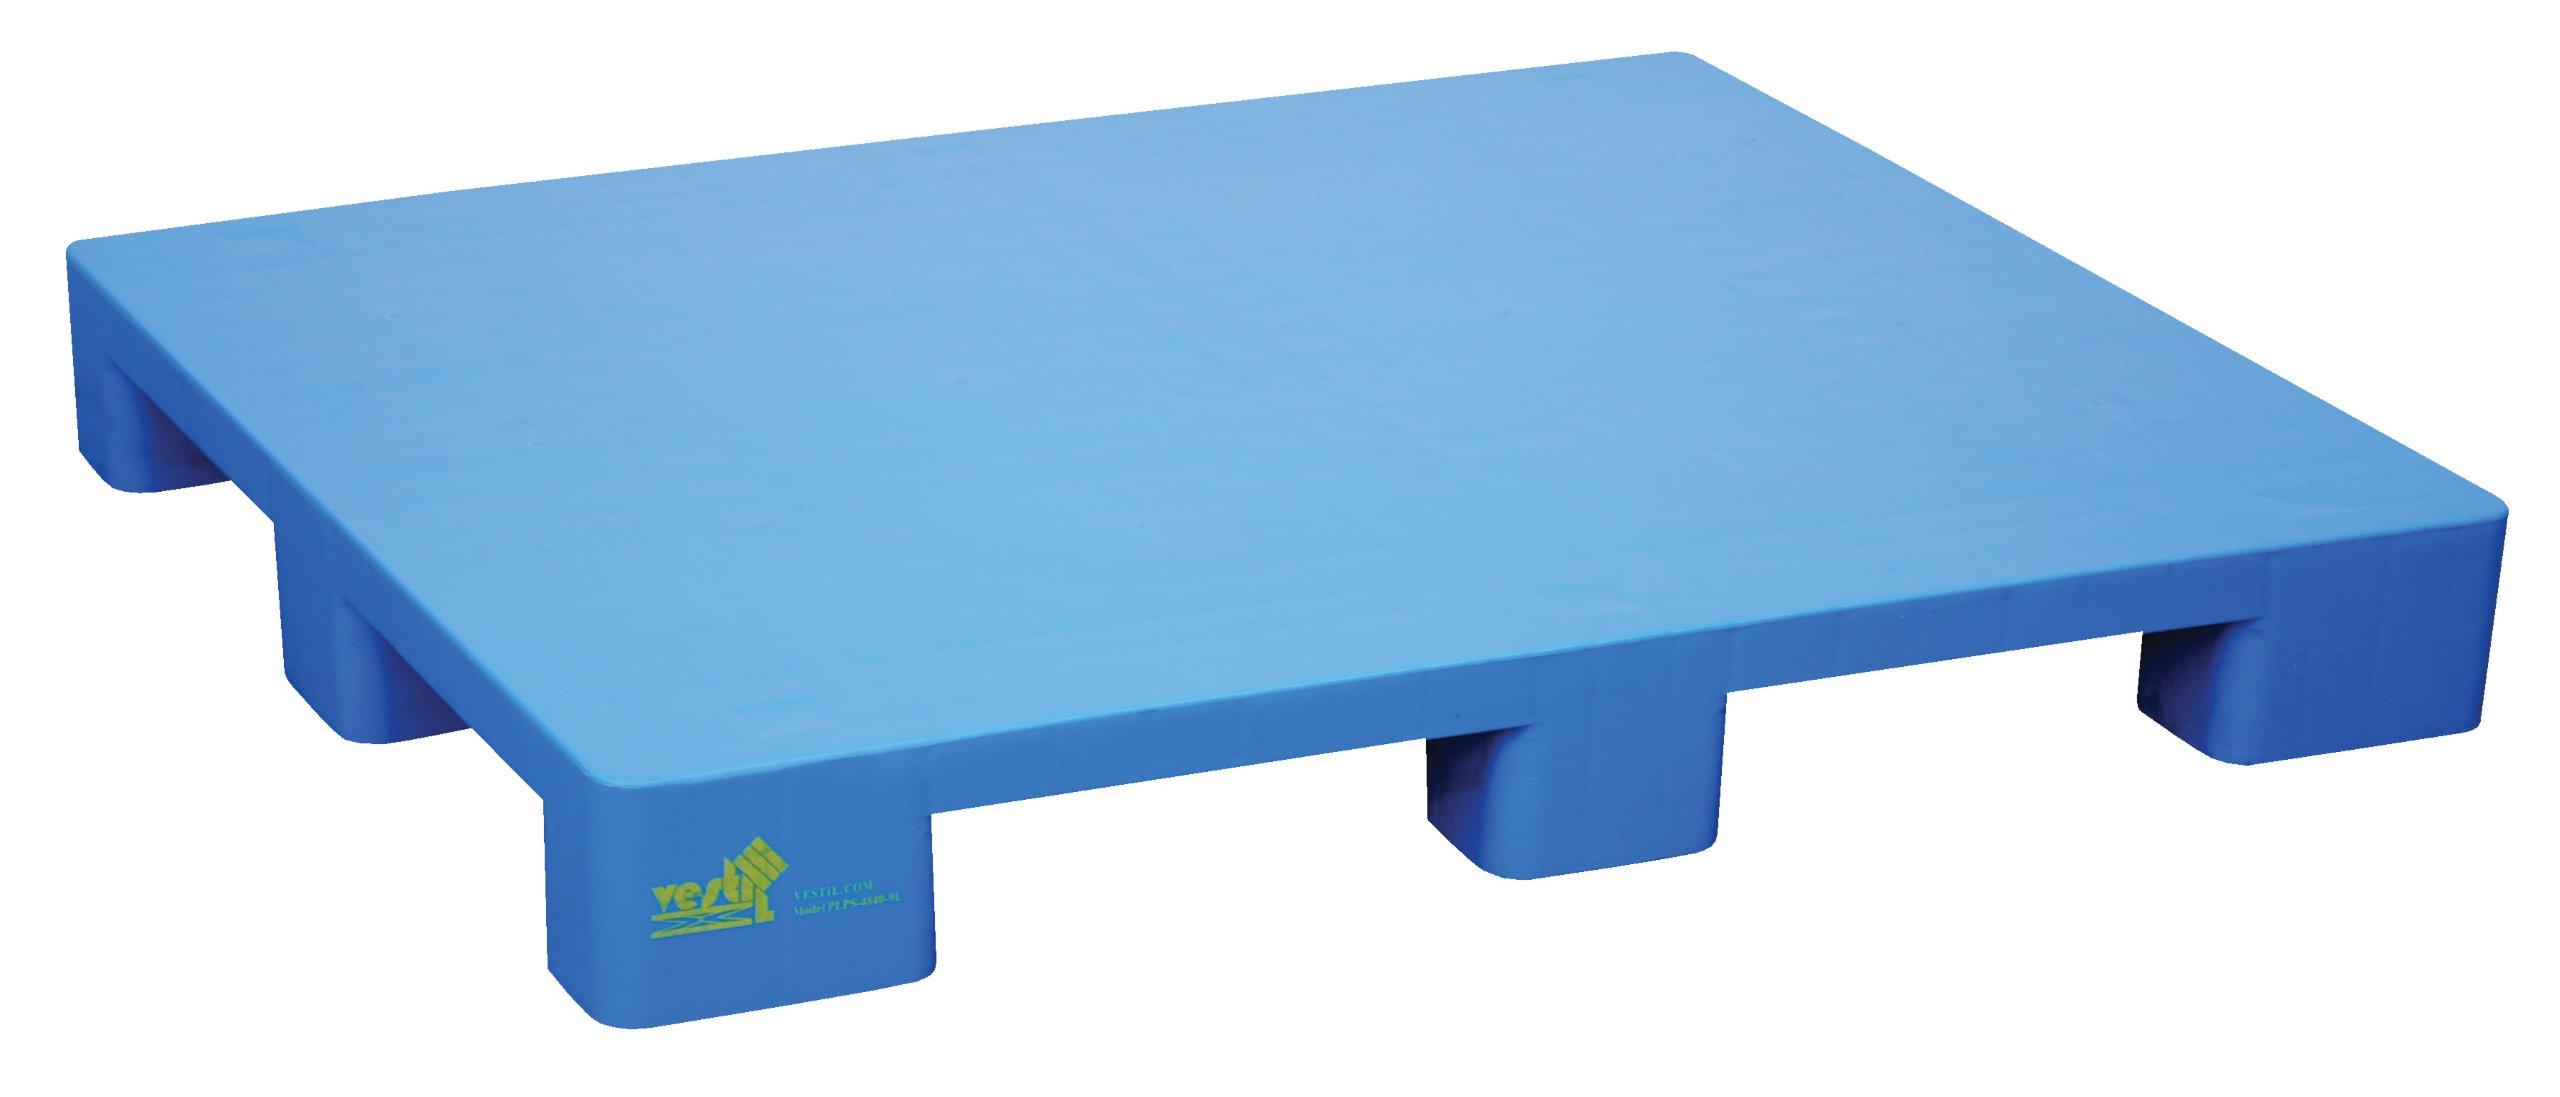 Vestil PLPS-4840-9L Hygienic Blue Polyethylene Solid-Deck Skid with 9 Legs, 8,800 lb. Capacity, 39'' Length, 46-7/8'' Width, 5-1/2'' Height by Vestil